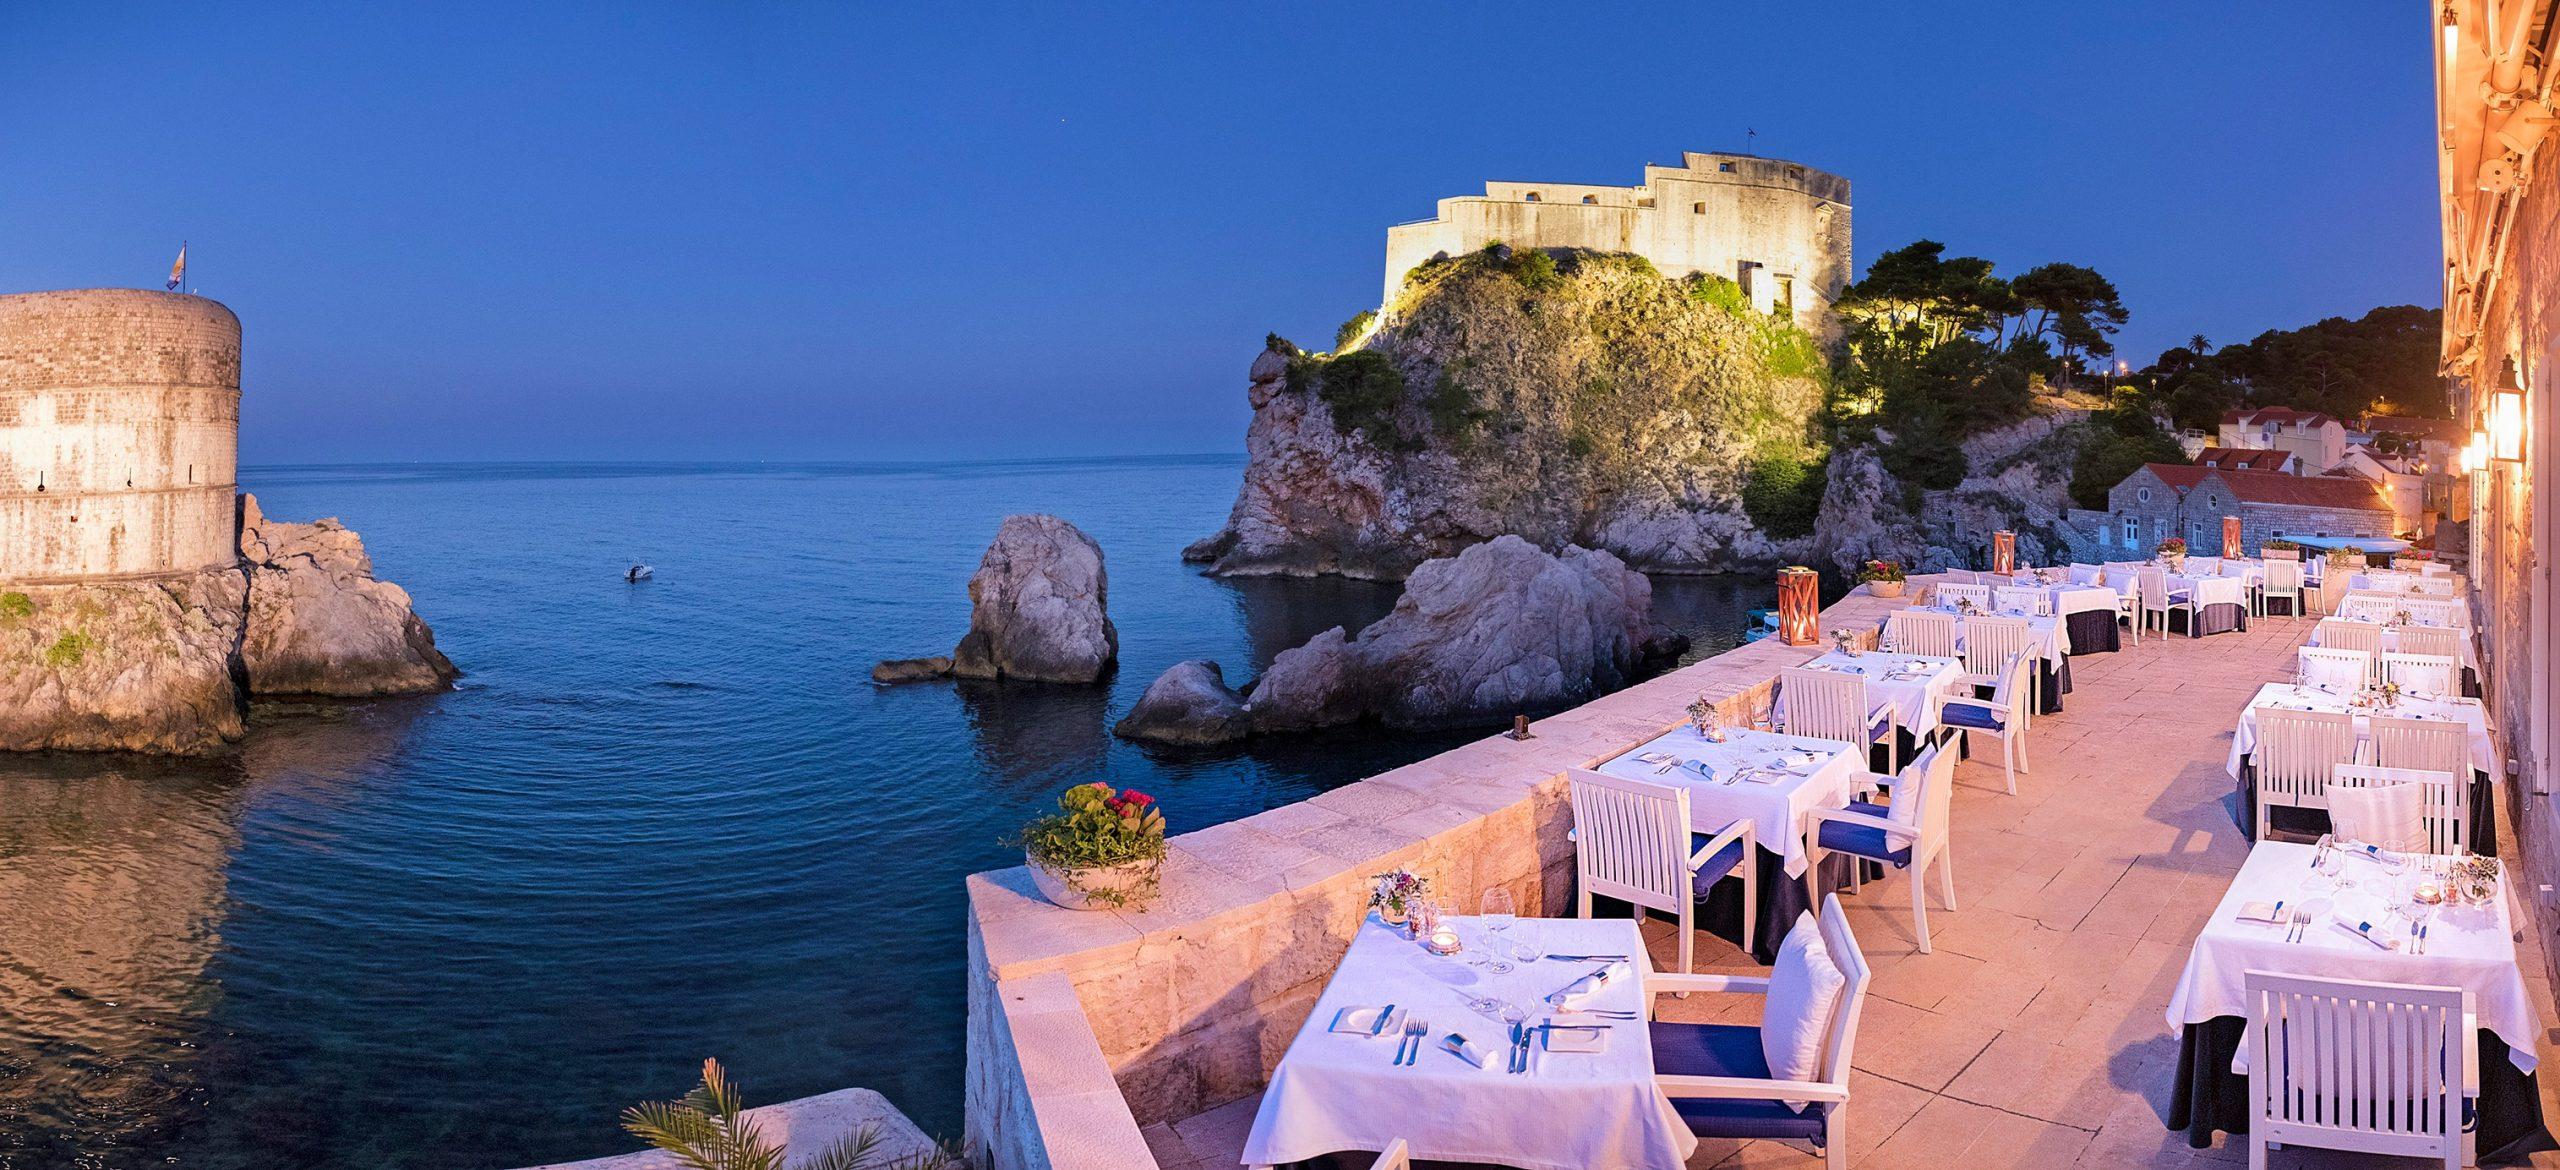 Nautika In Dubrovnik On Cnns Worlds Best Waterfront